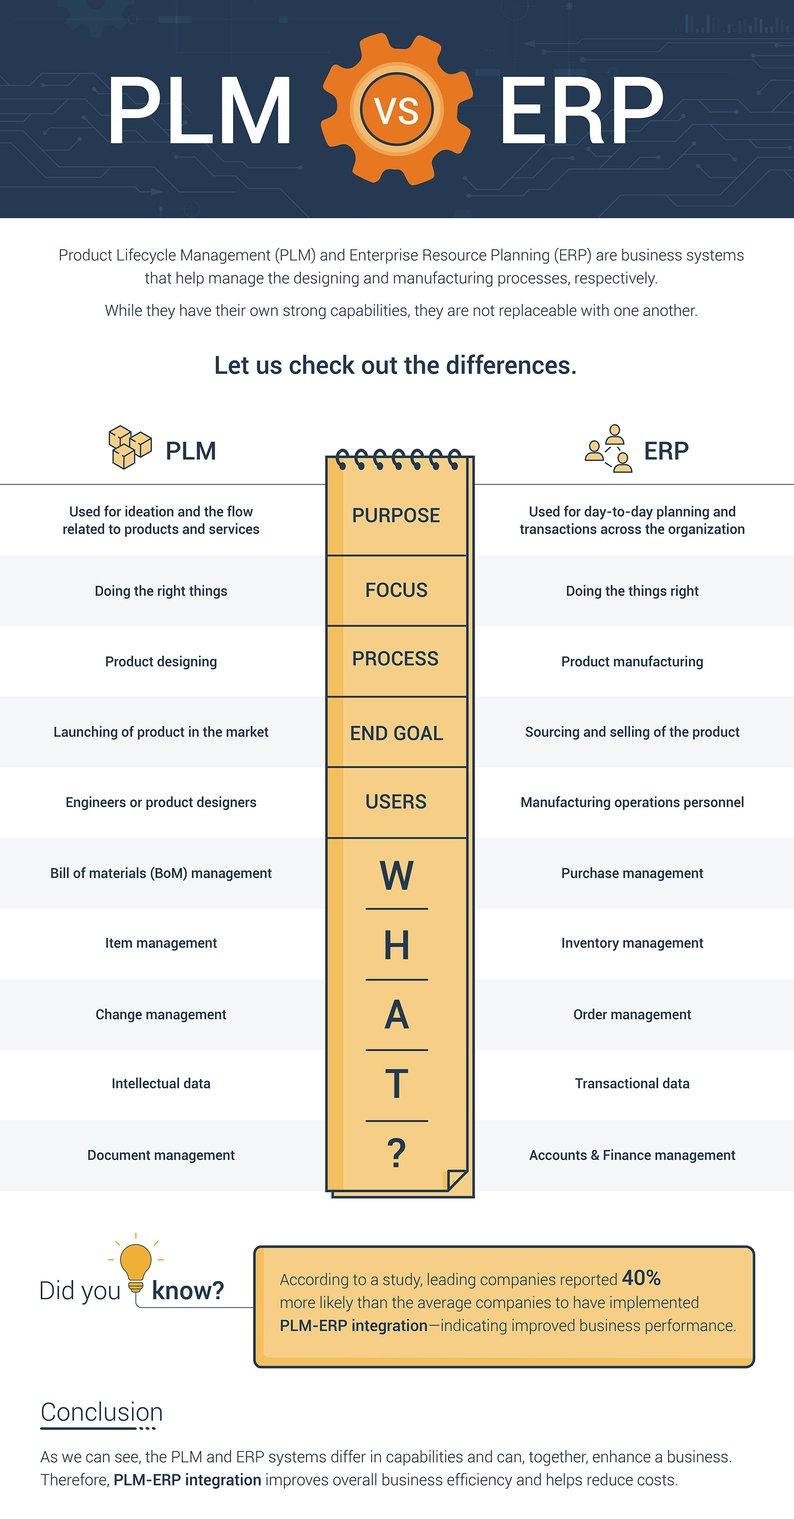 PLM-vs.-ERP-Infographic-1